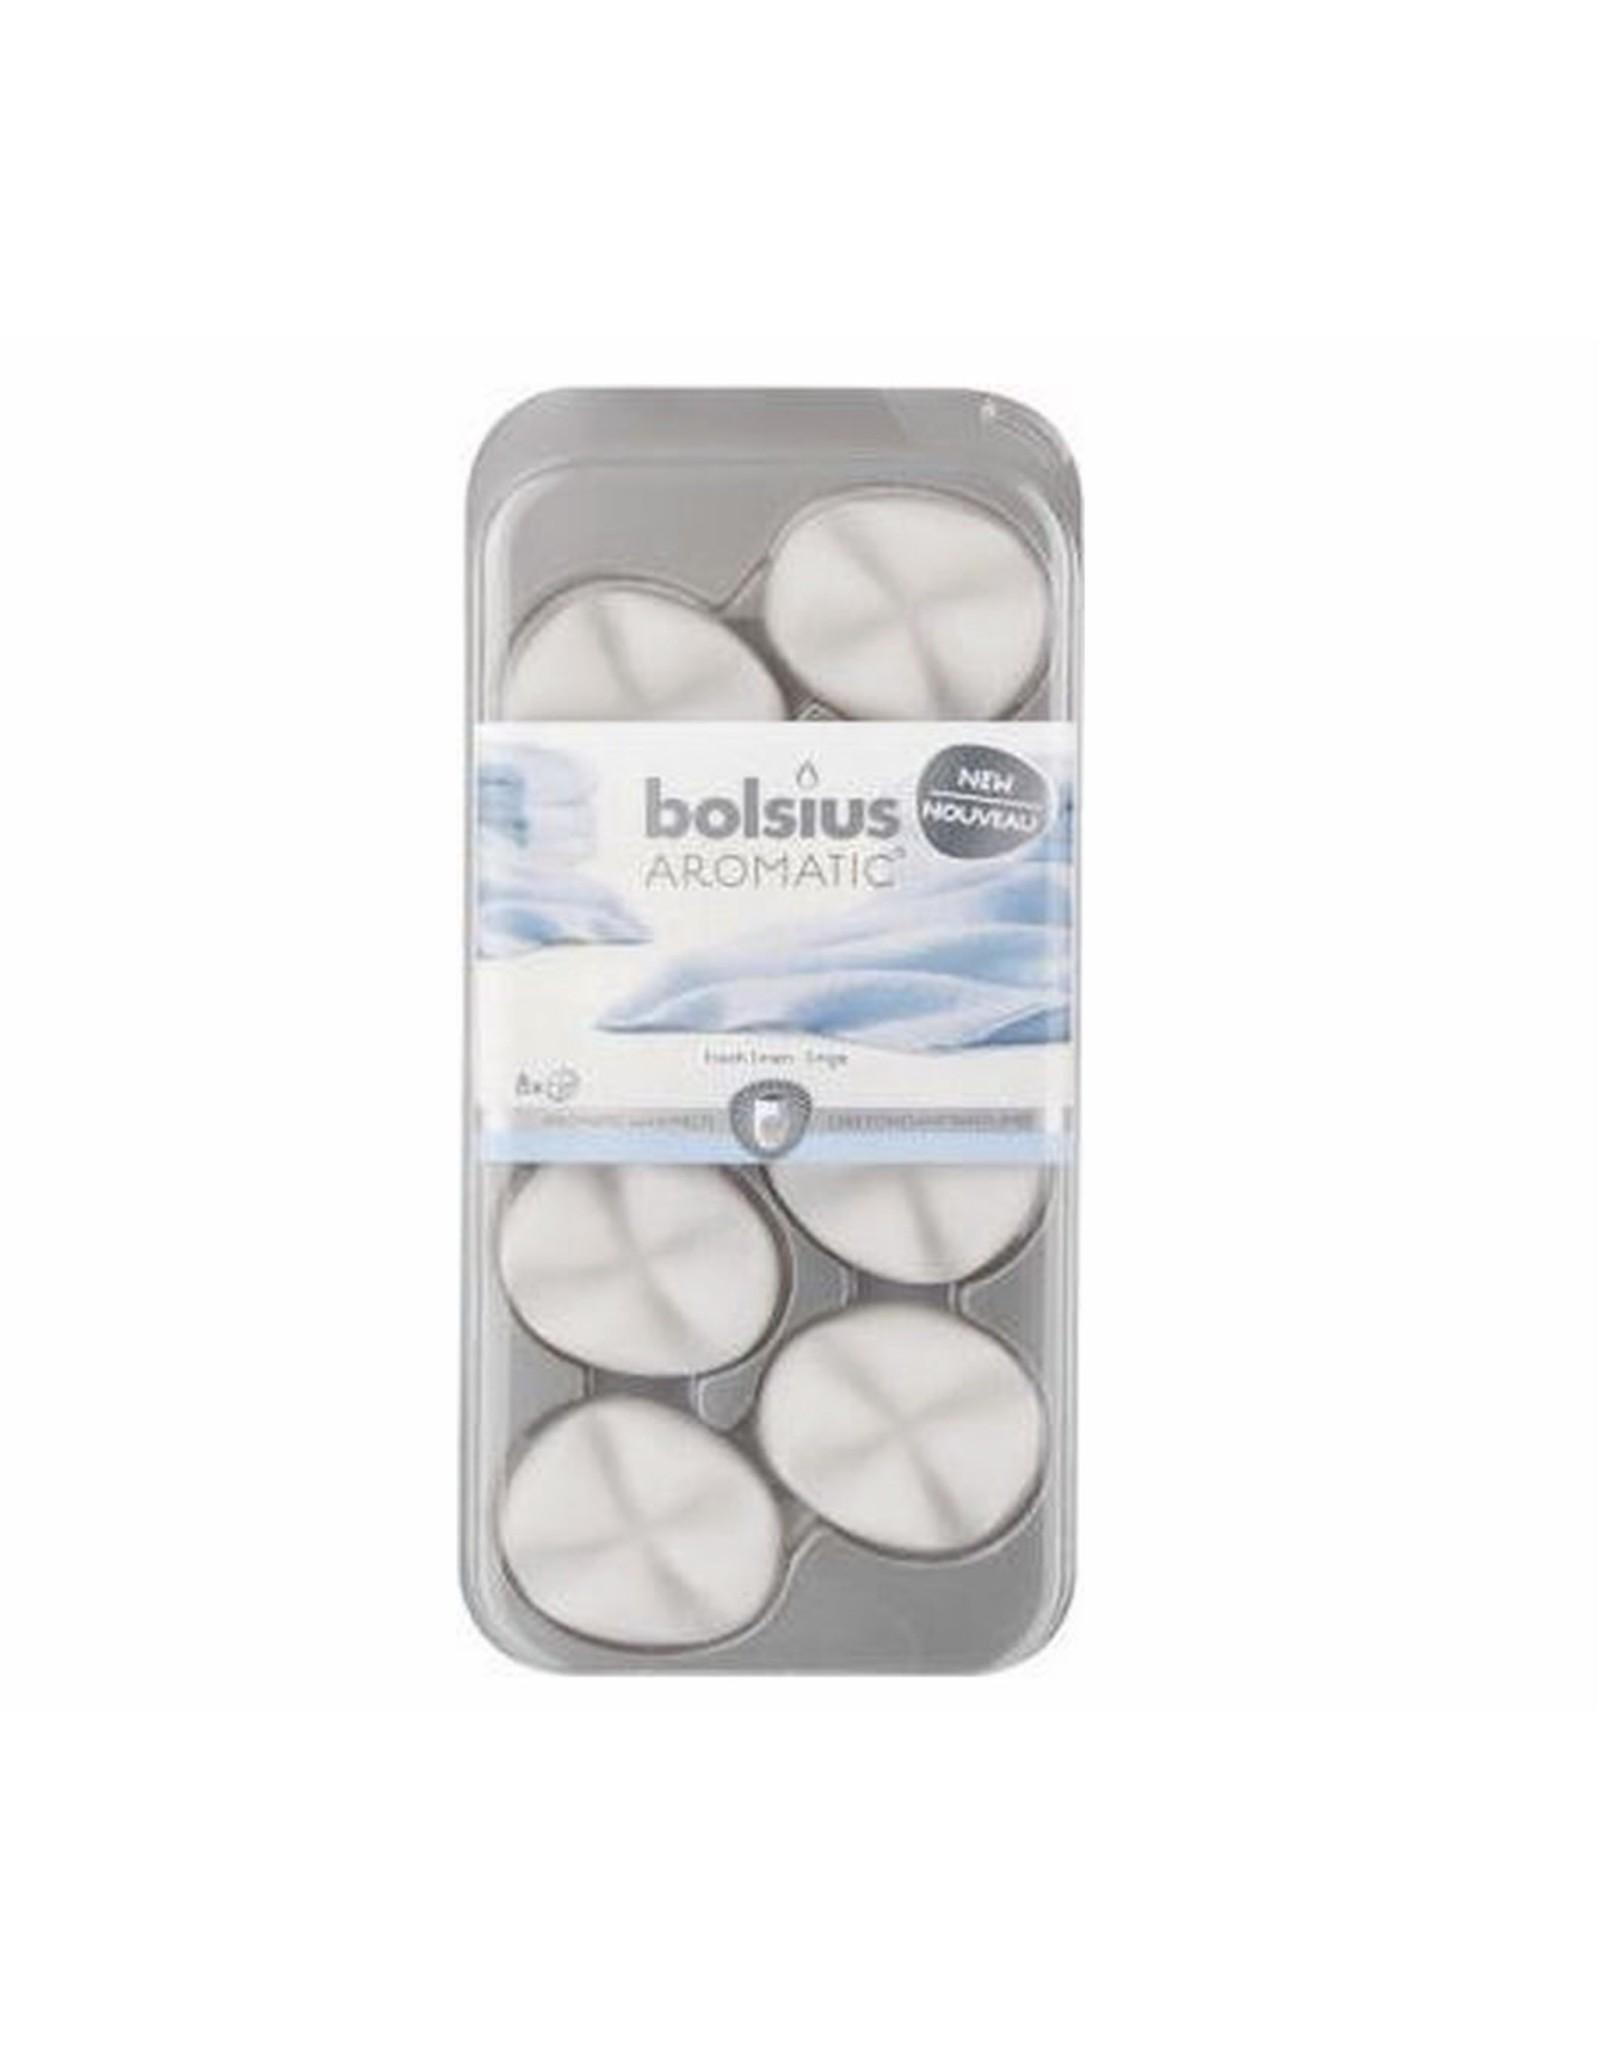 Bolsius Aromatic Wax Melts - Fresh Linnen